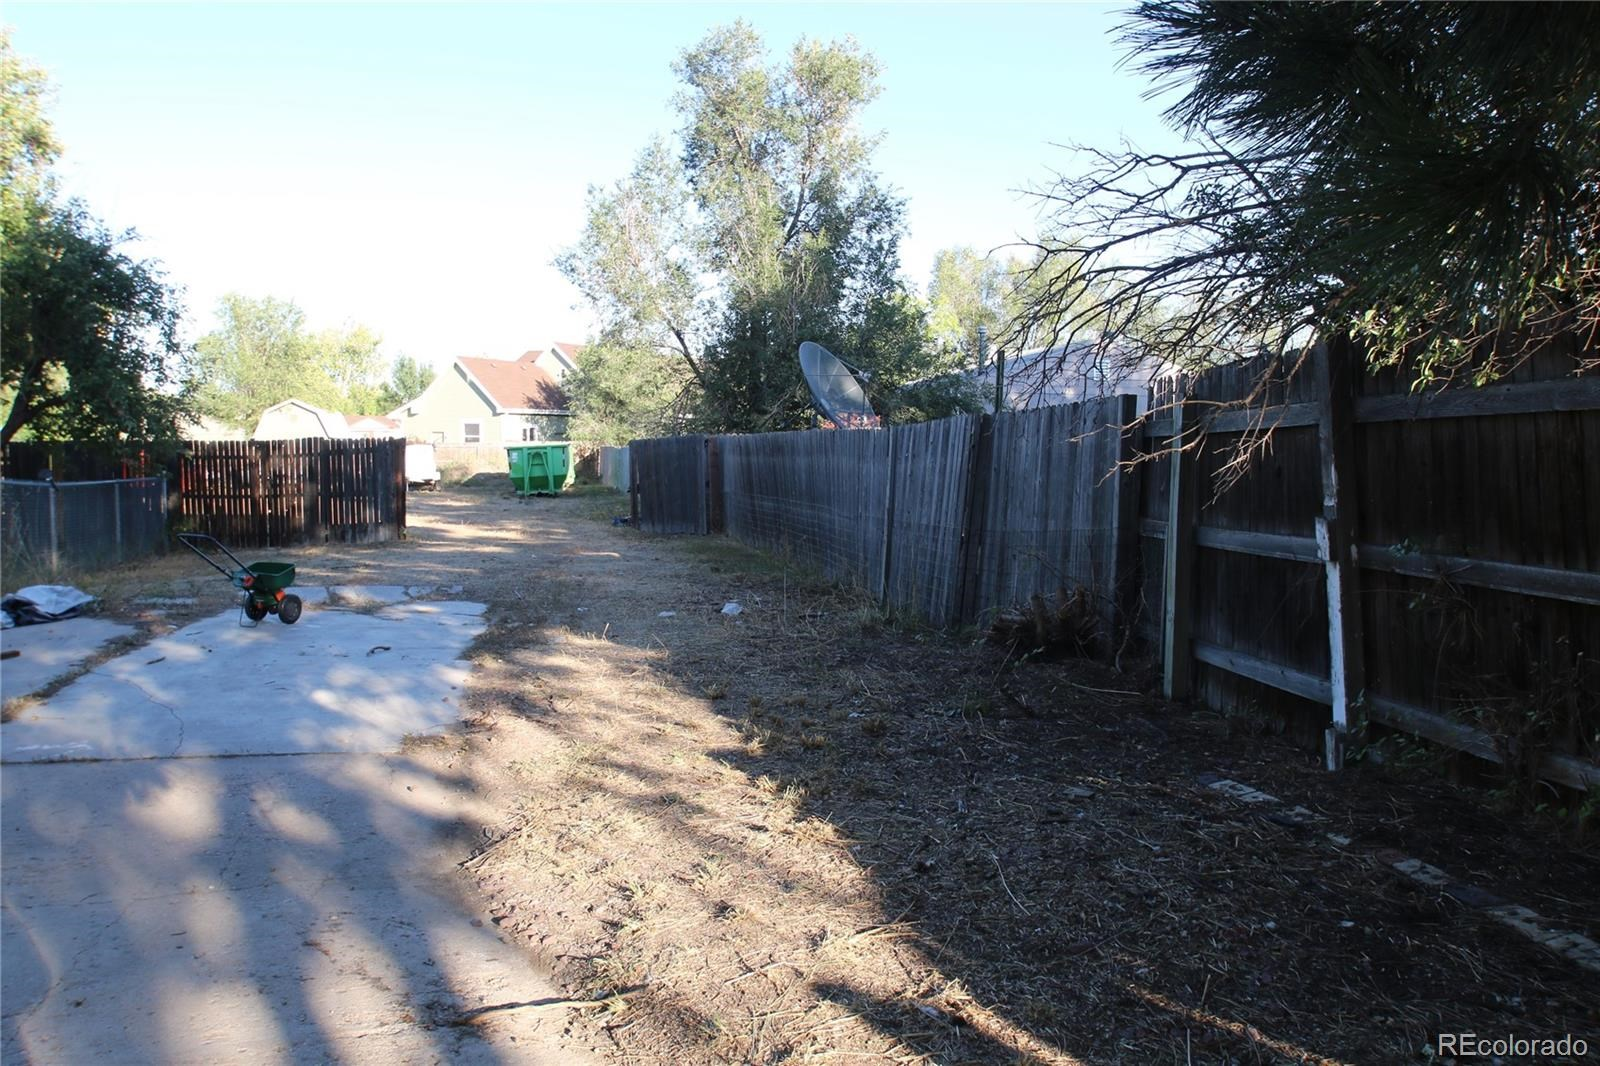 MLS# 8734408 - 4 - 2830 S Decatur Street, Denver, CO 80236